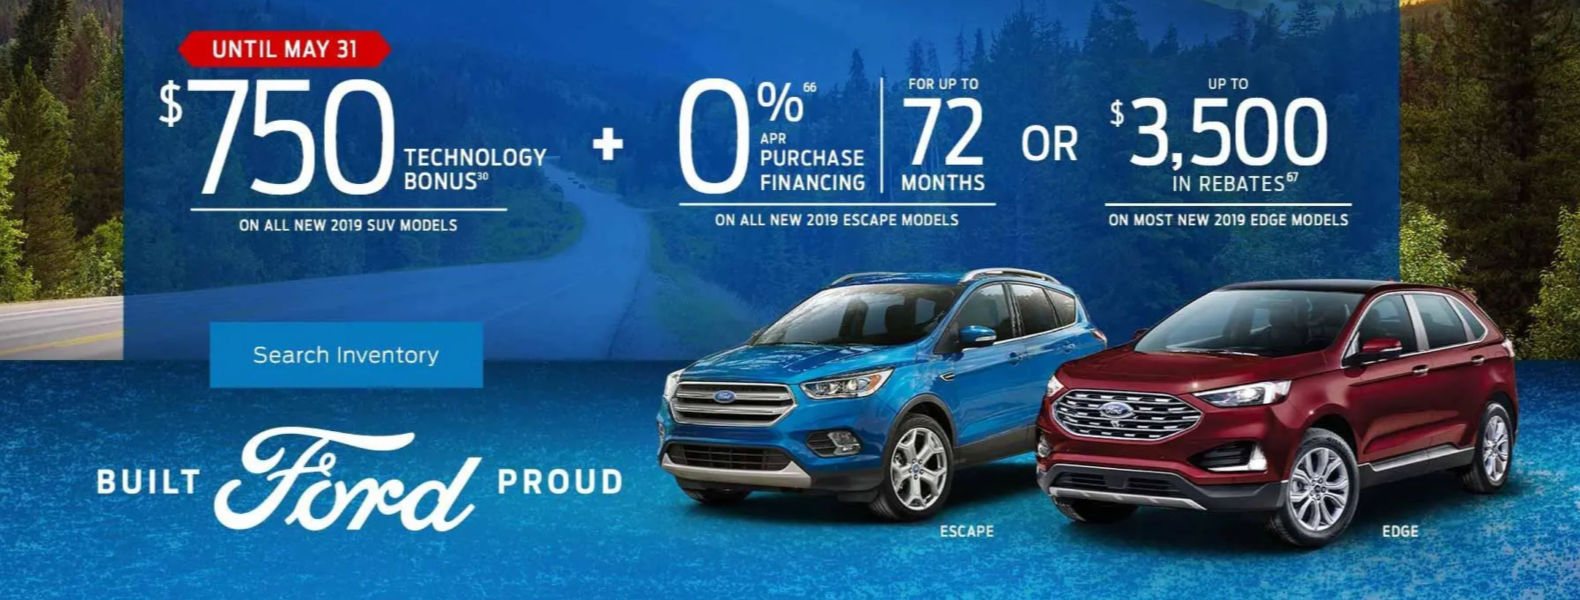 Ford espape edge 2019 Perth ON